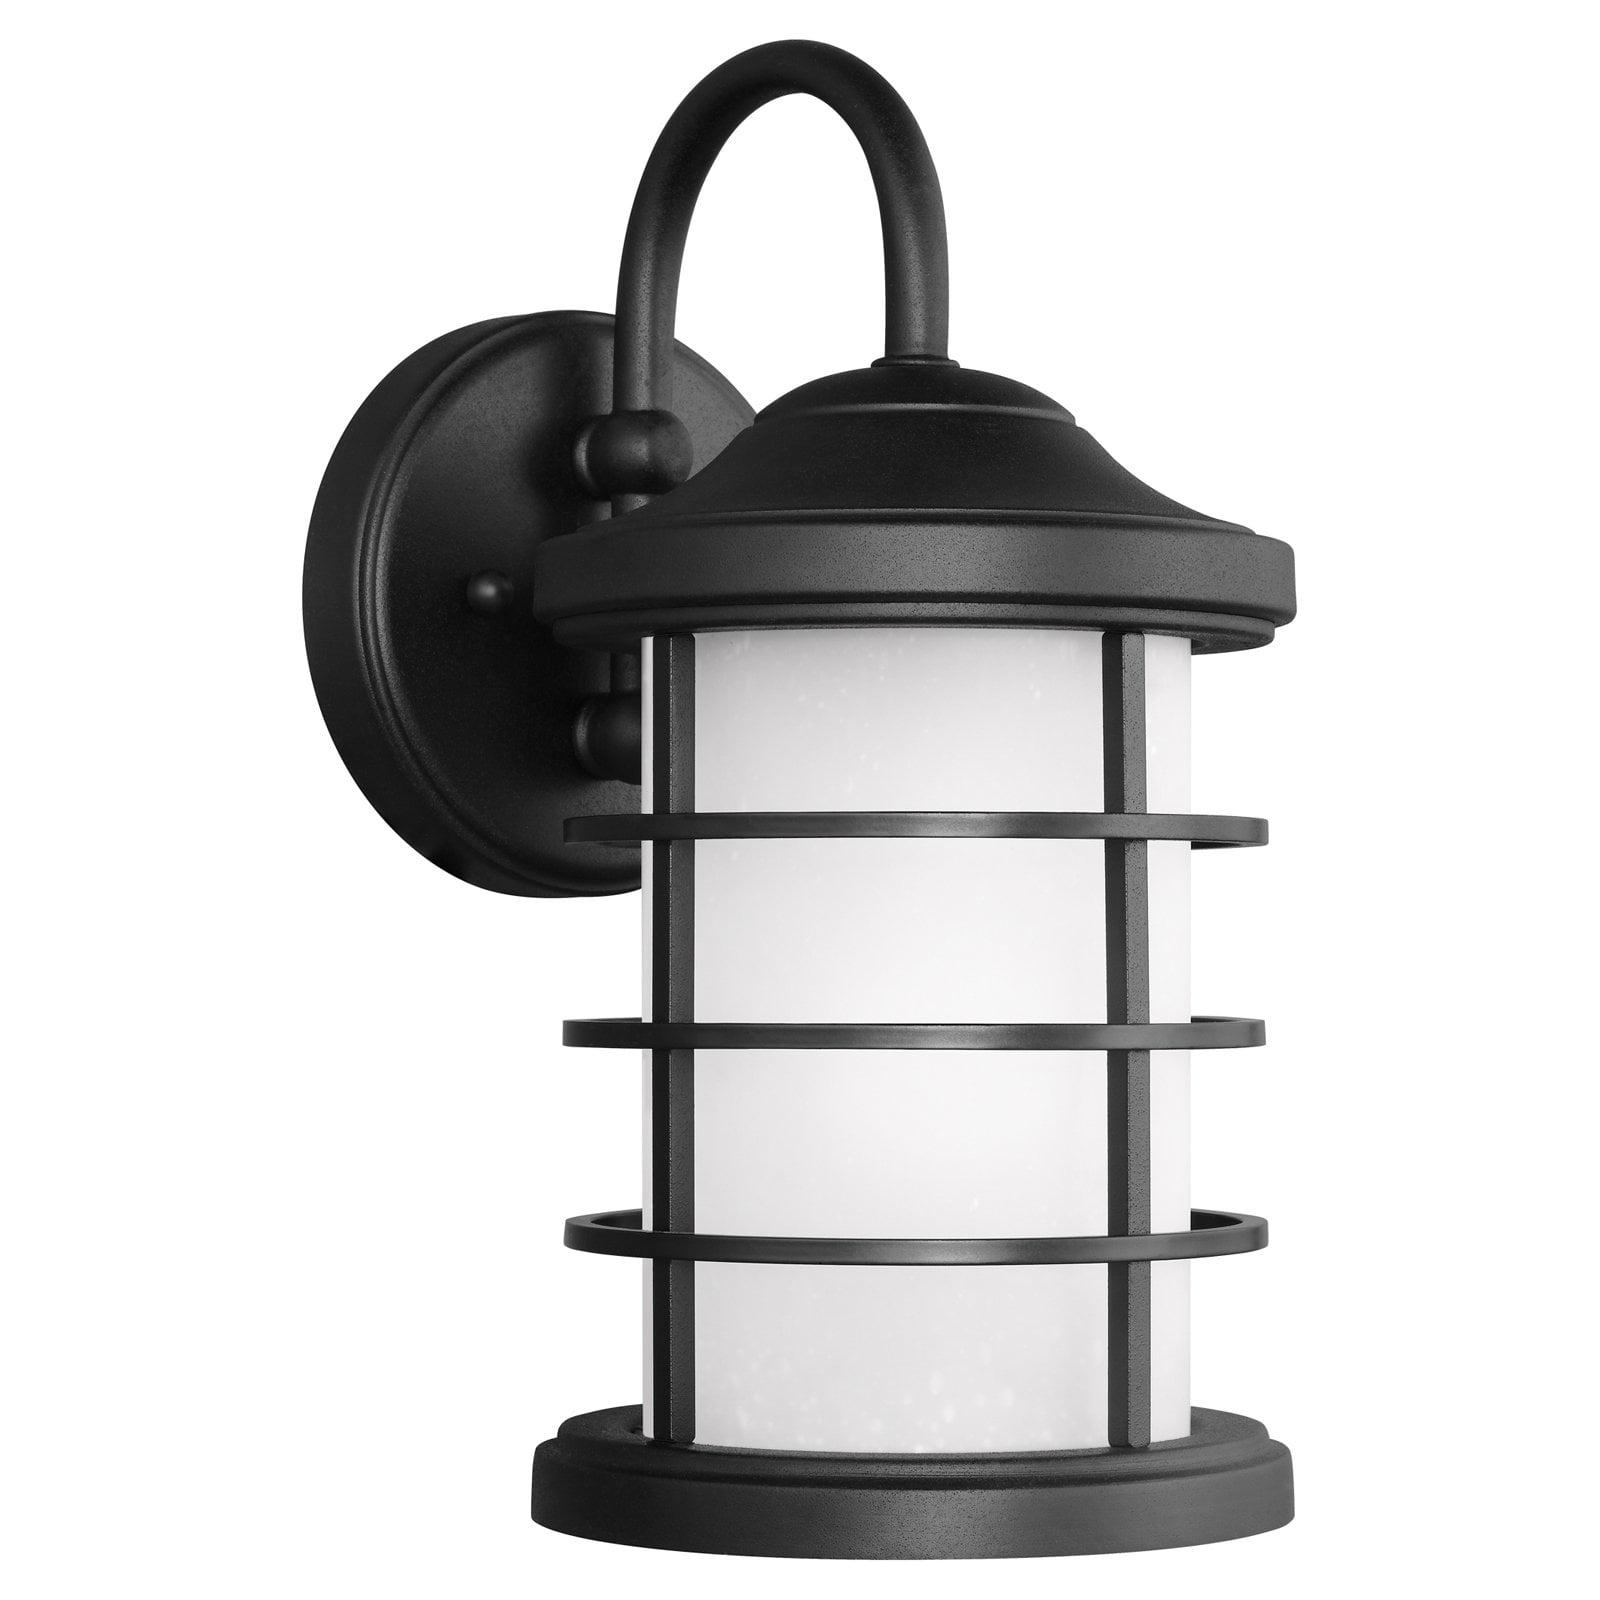 Sea Gull Lighting Sauganash 8524451 Outdoor Wall Lantern